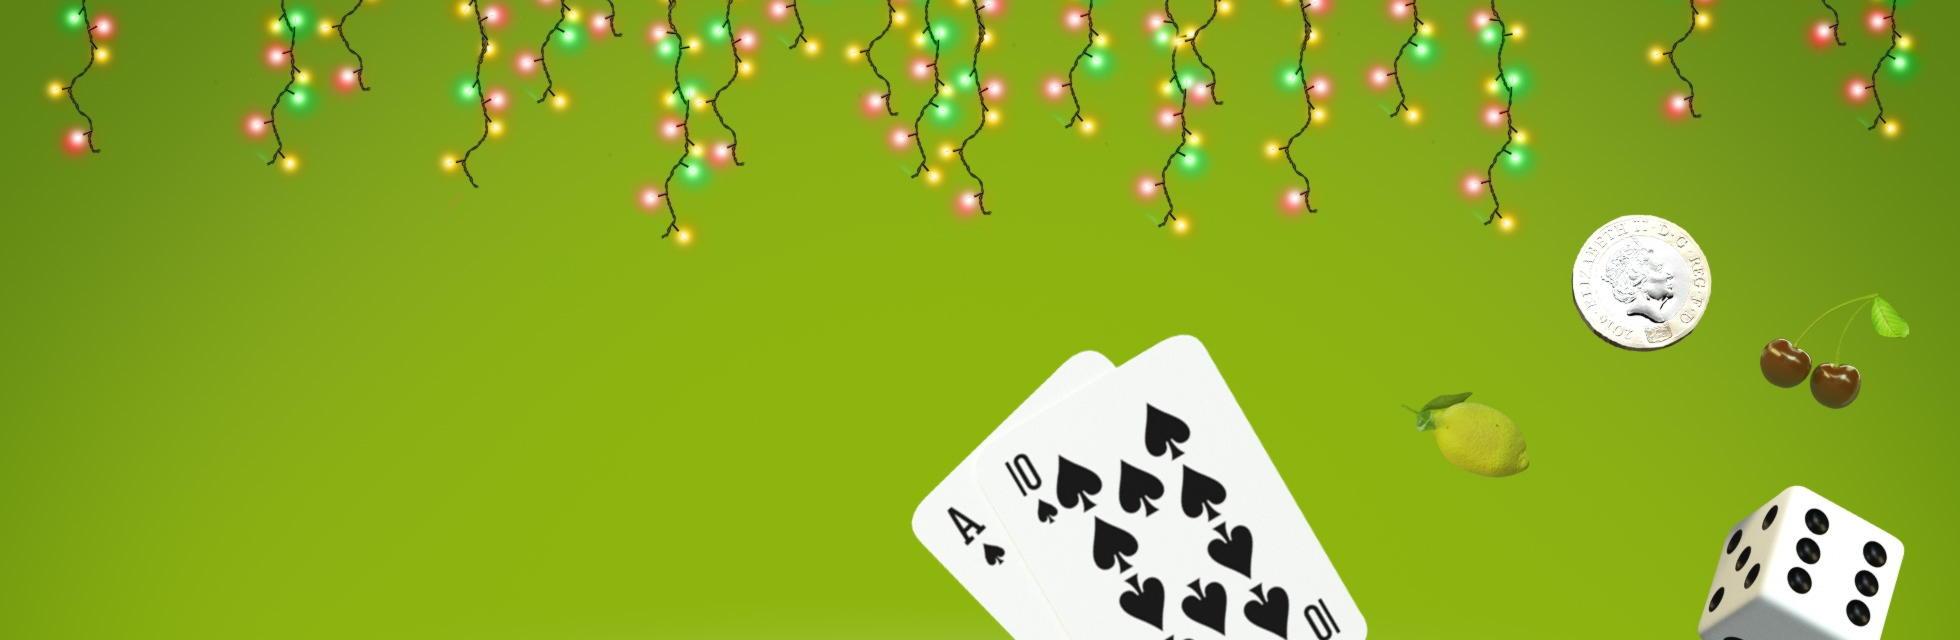 190 Free Spins no deposit casino at Spinit Casino